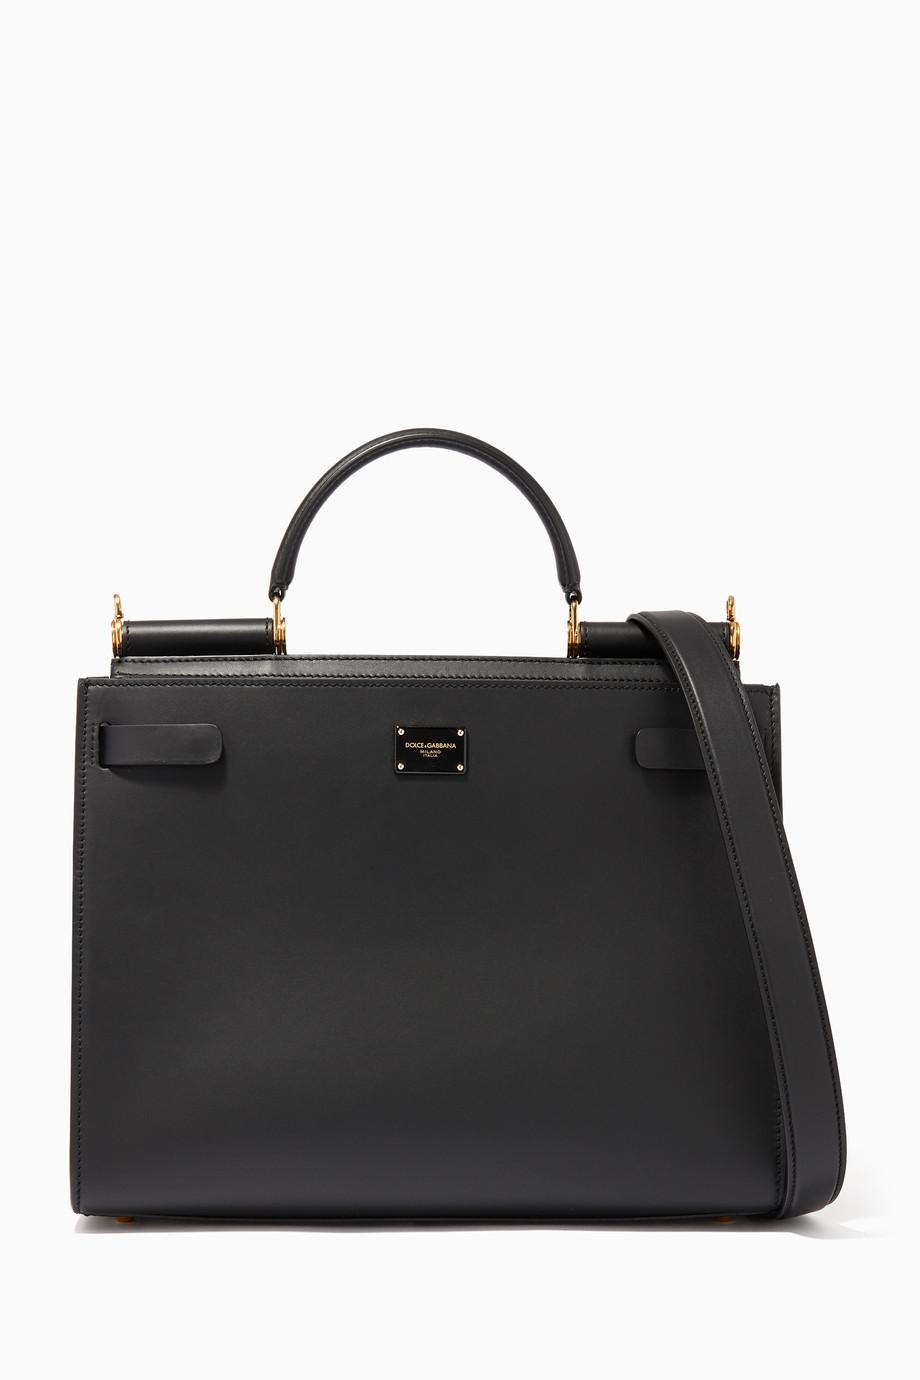 72c5f446271 Shop Dolce & Gabbana Black Sicily 62 Large Calfskin Handbag for ...